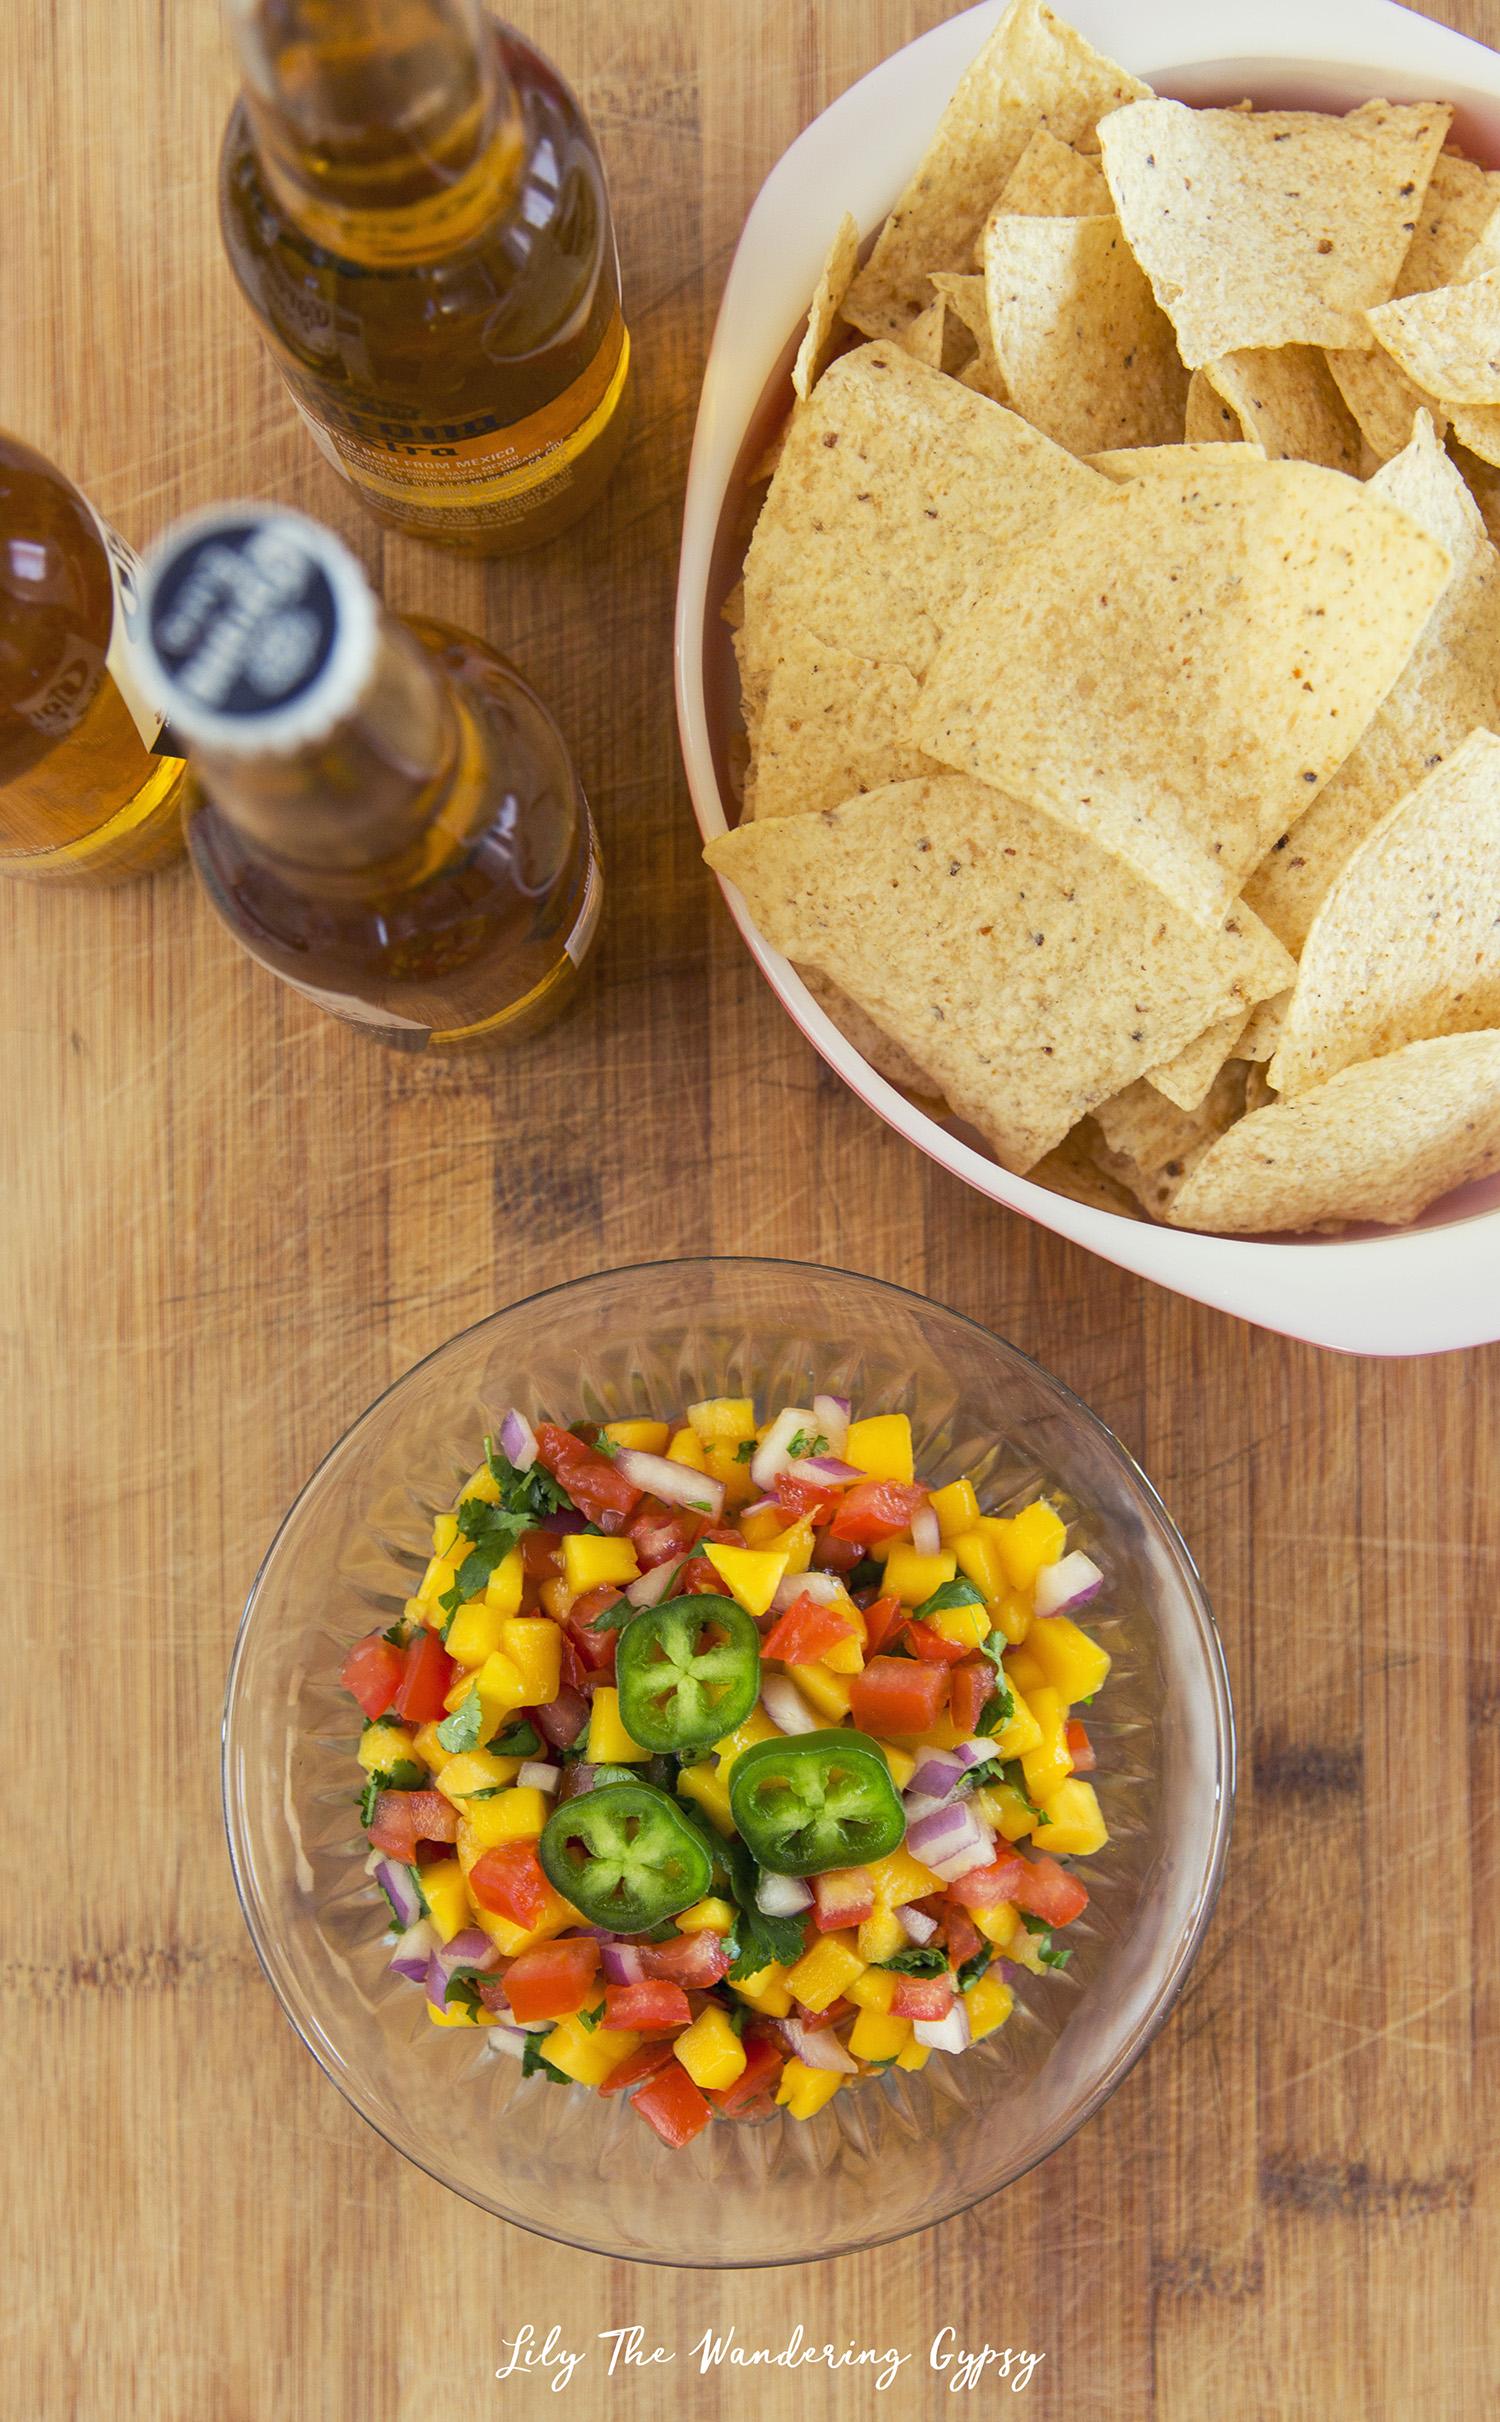 Mango Salsa Recipe by Lily The Wandering Gypsy